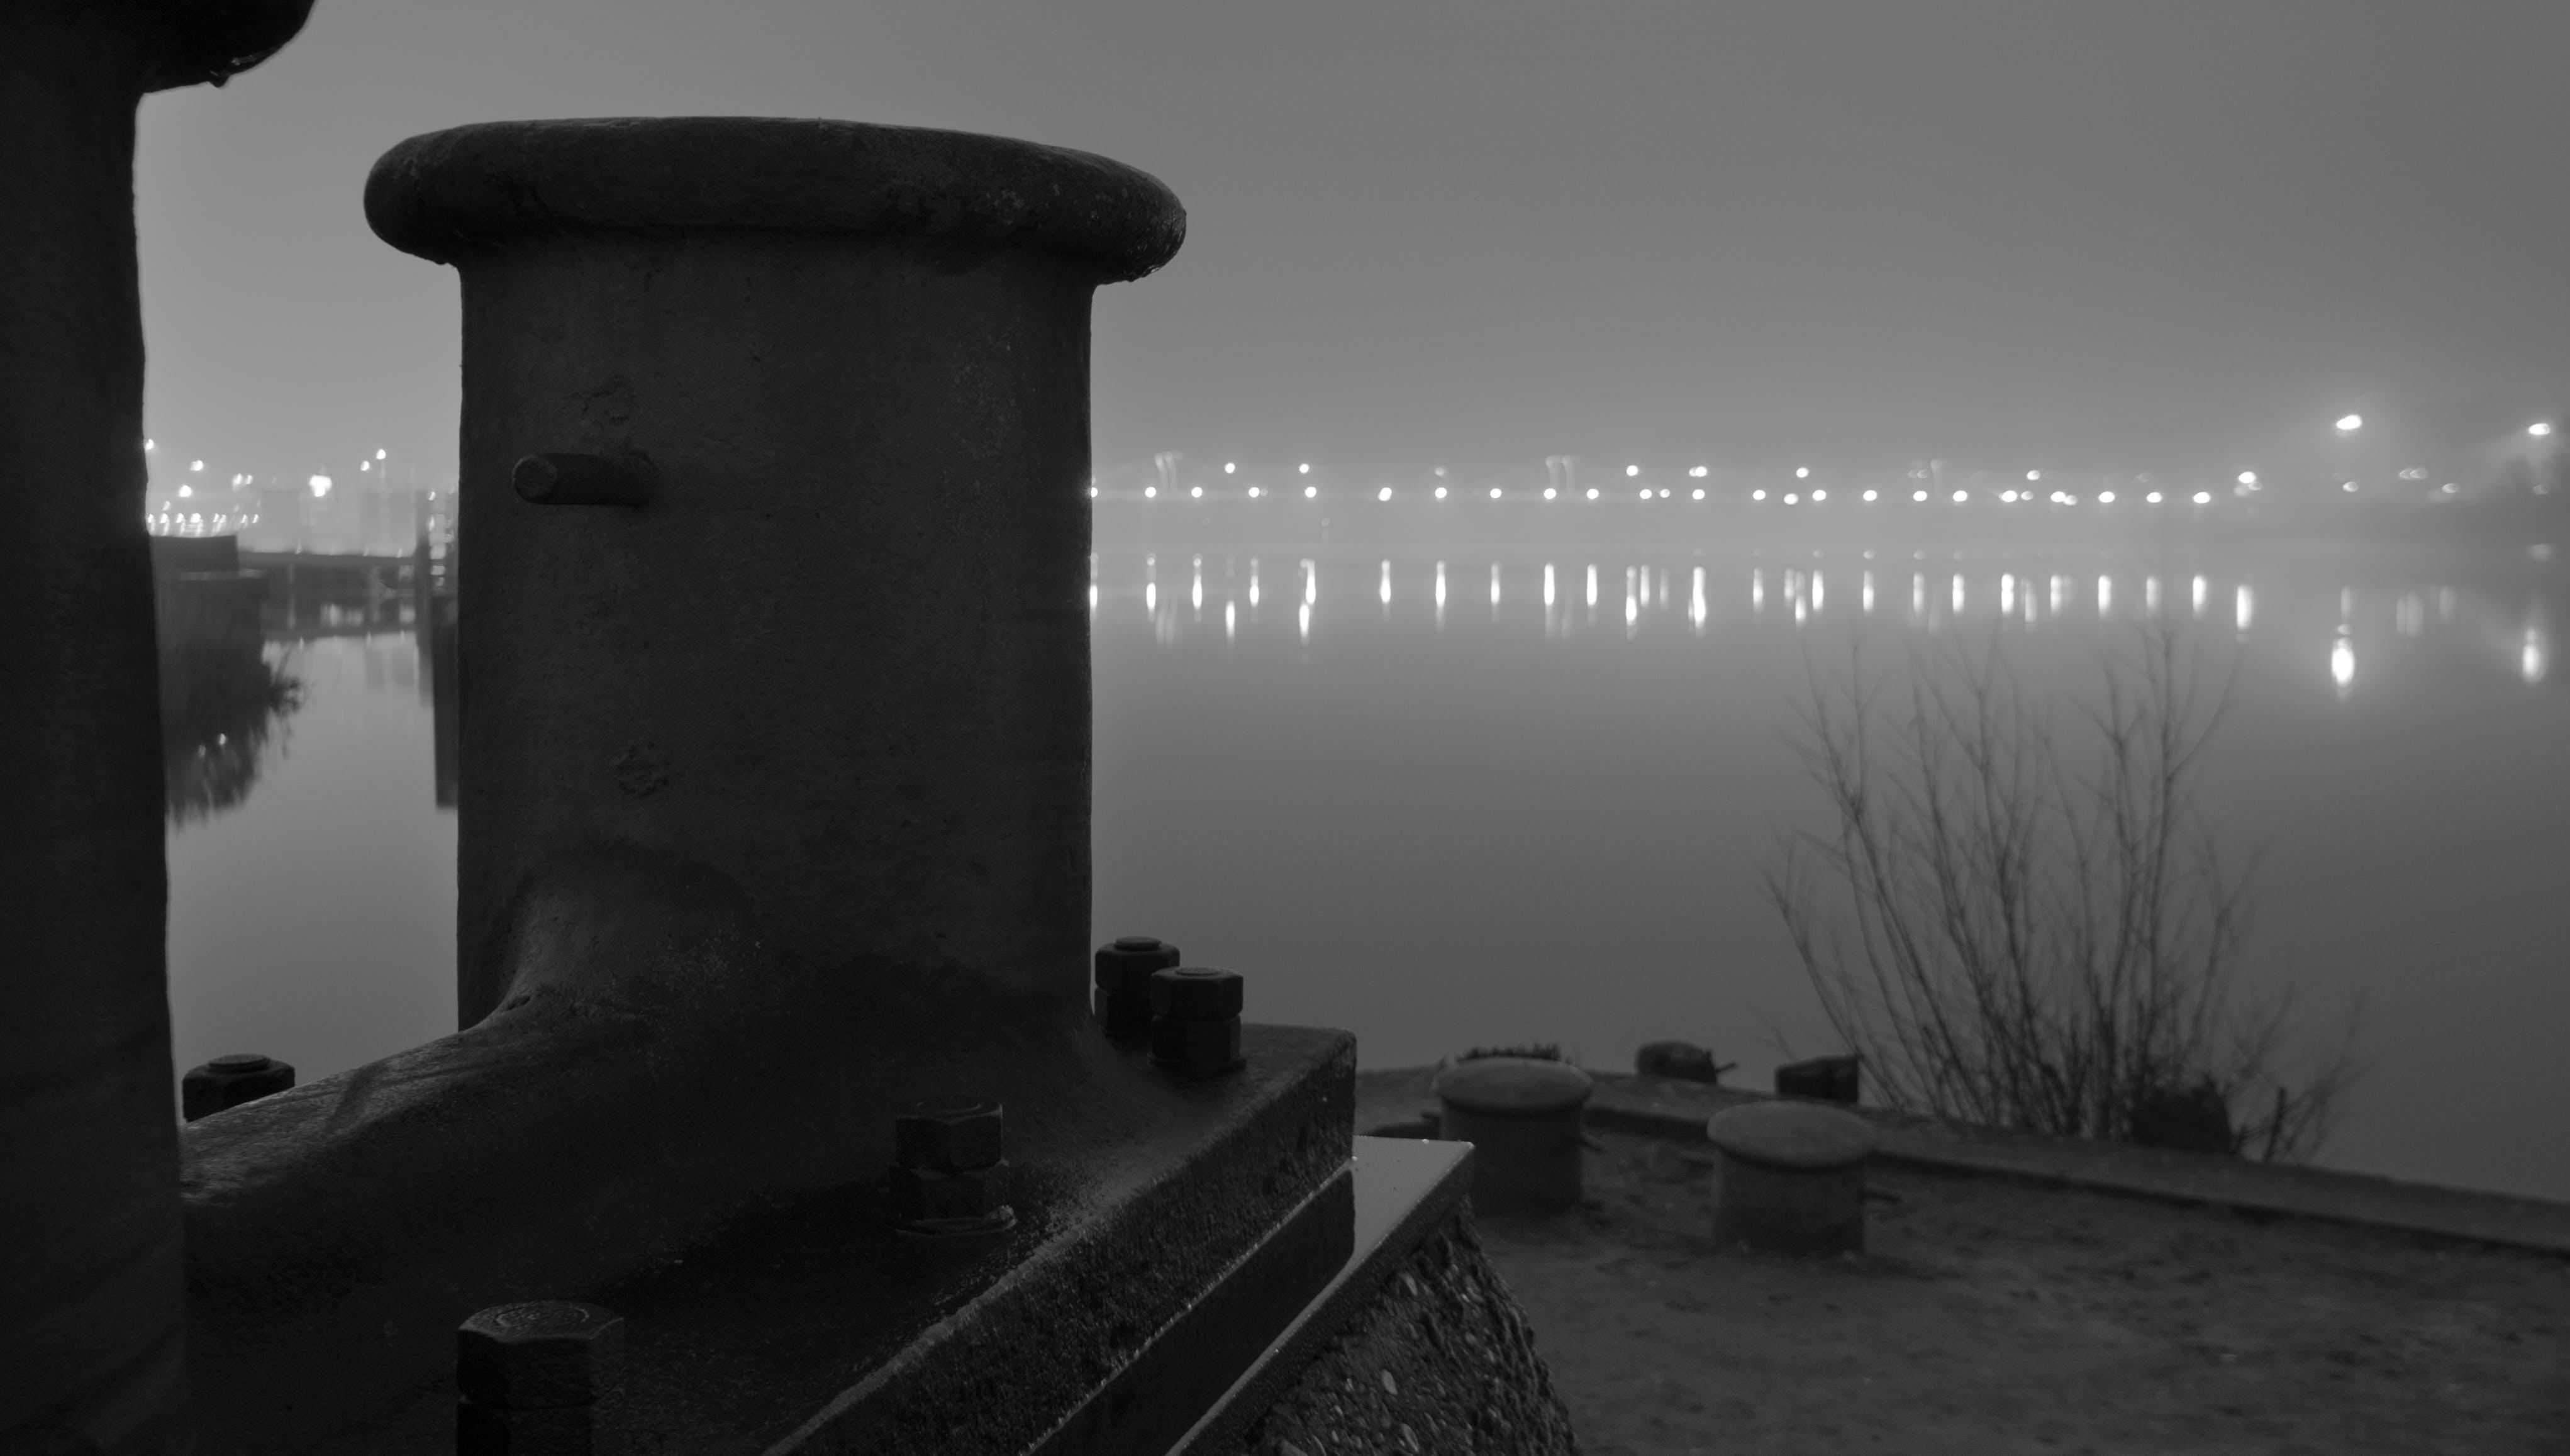 Free stock photo of black and white, bolder, bridge, city lights